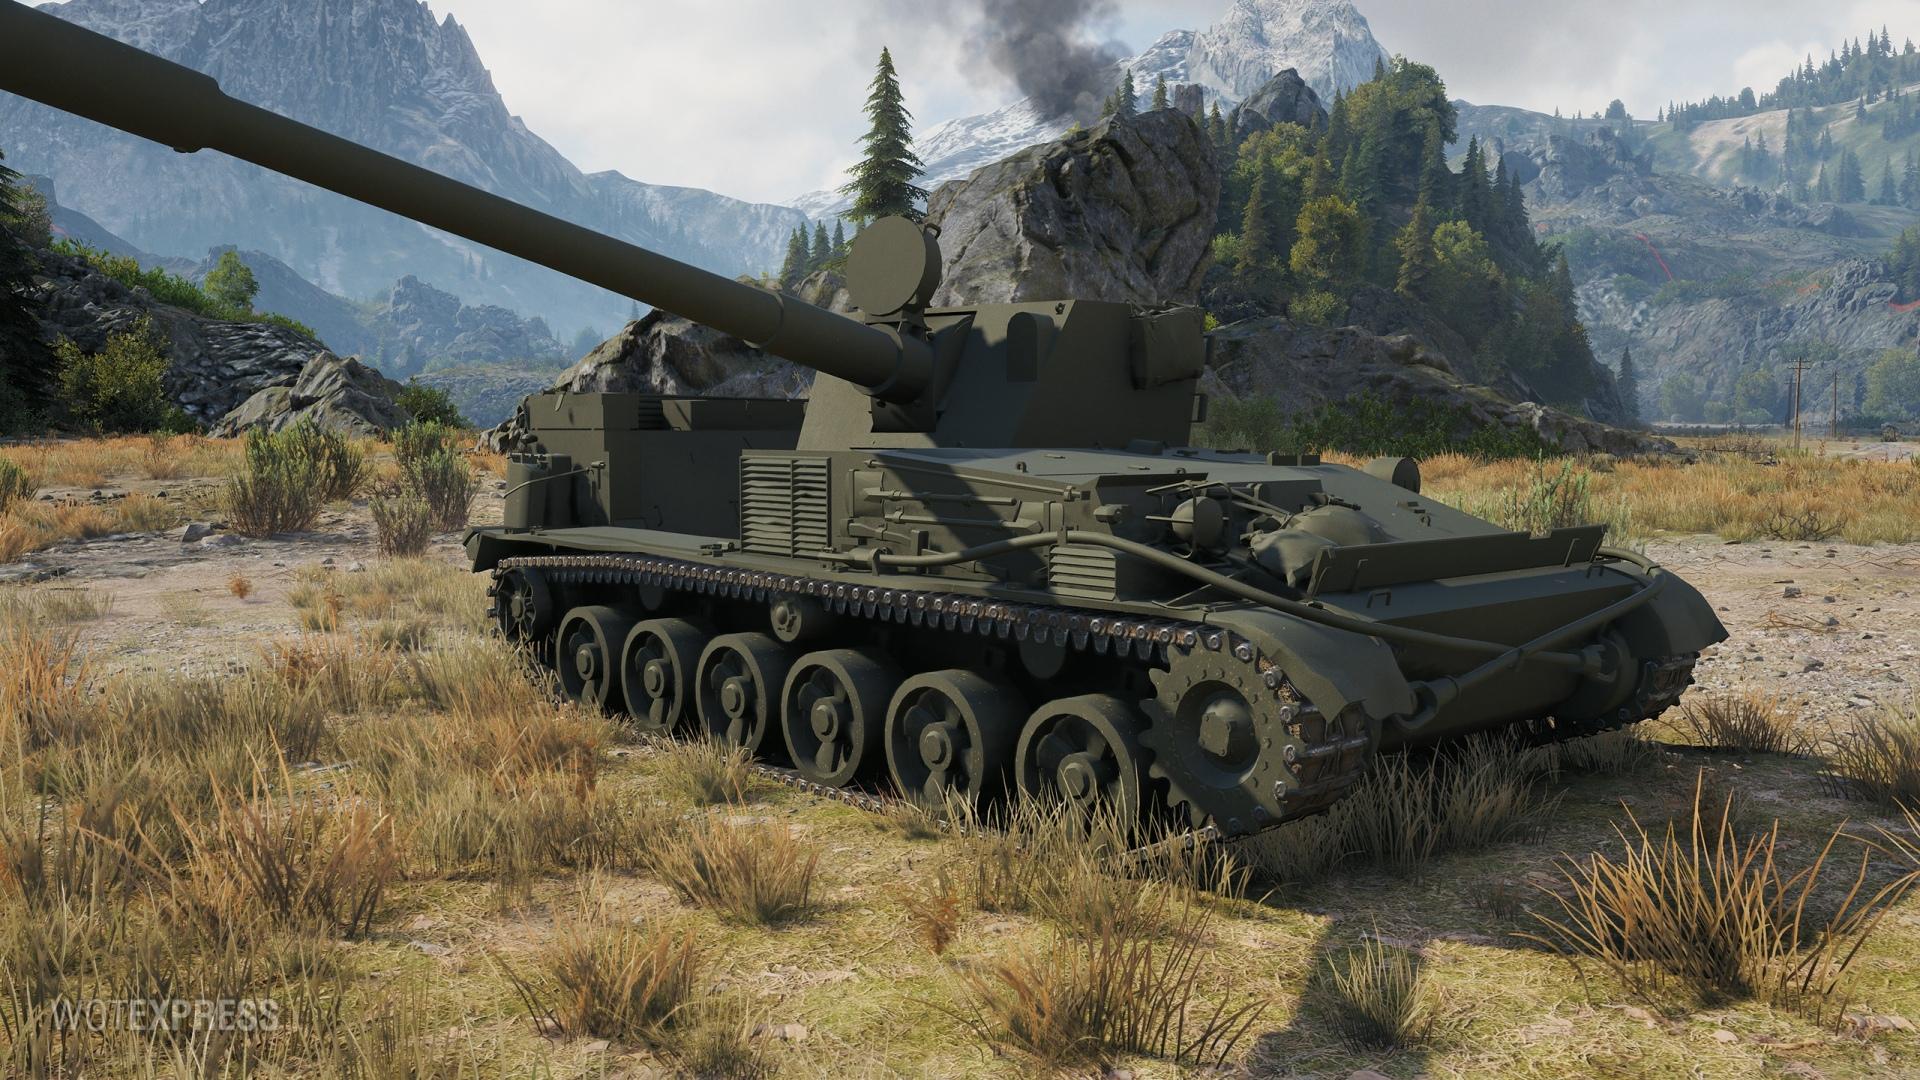 Z-SXaGr4e6U